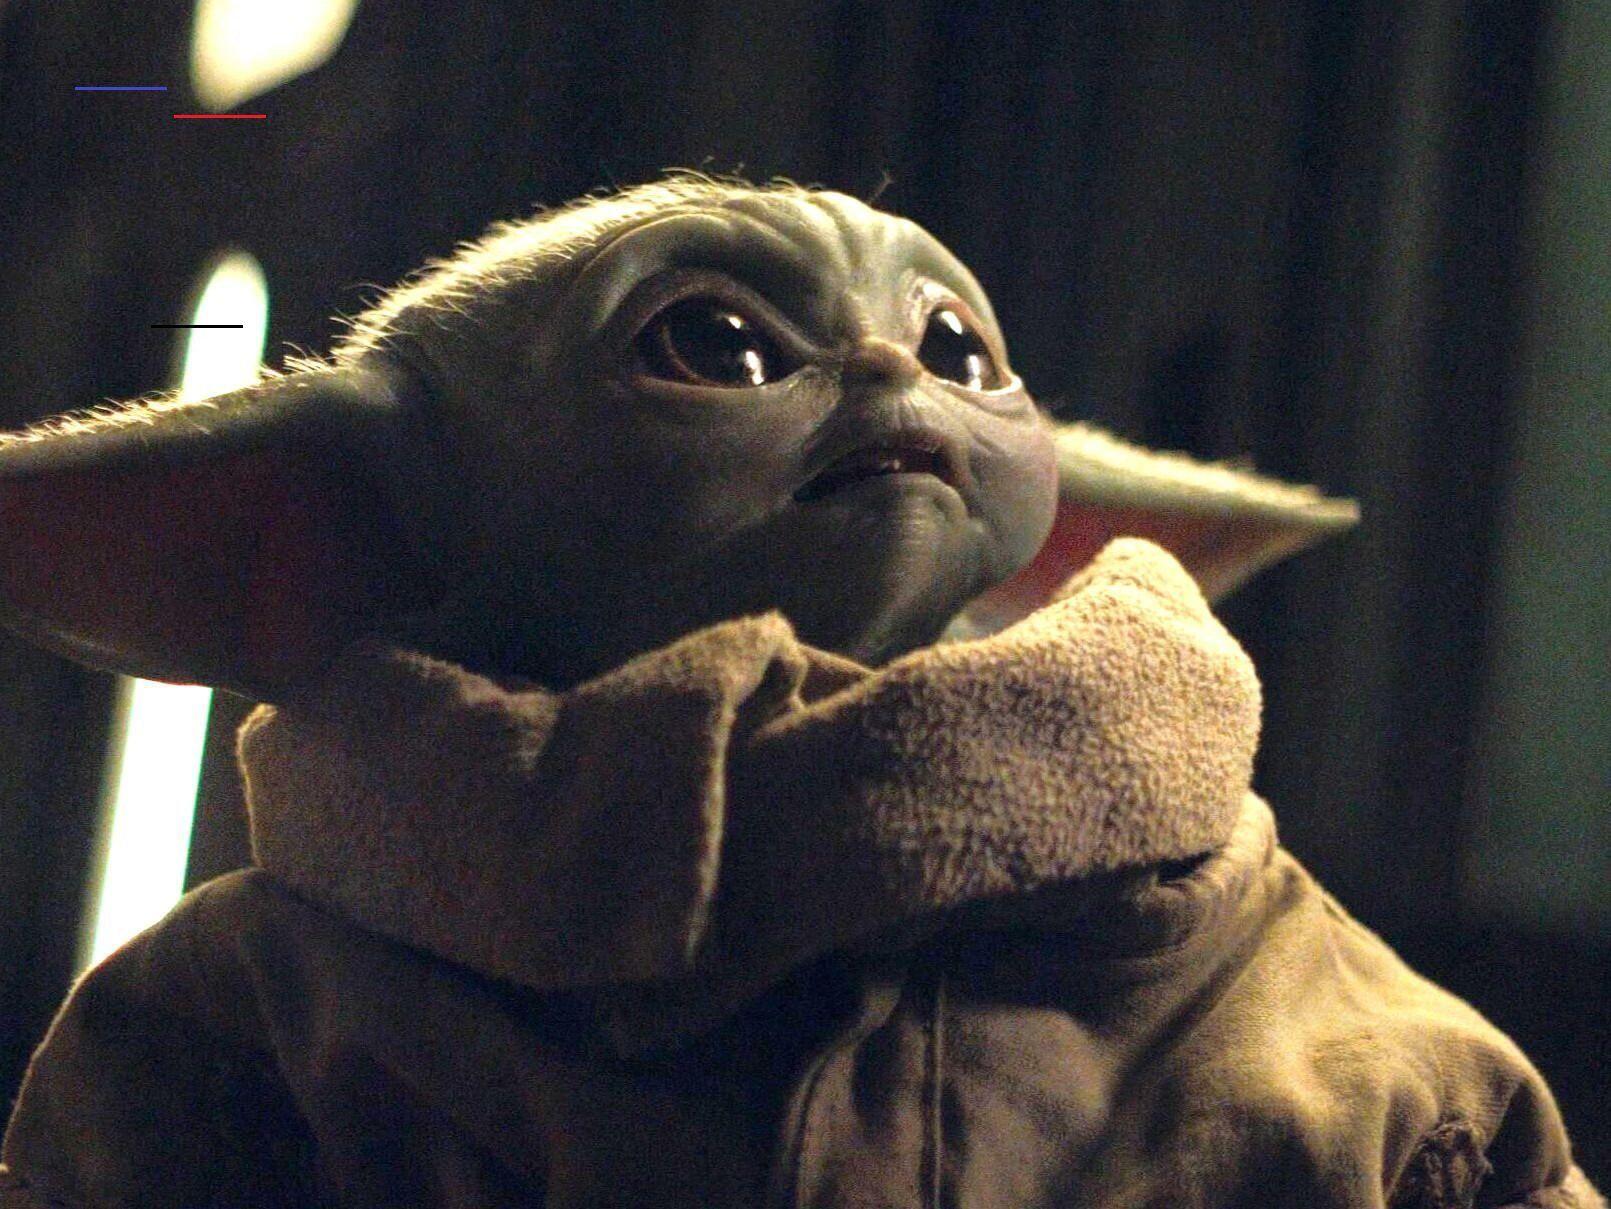 Oriana Nichelle On Twitter Babyyodawallpaper 2019 The Year Of Baby Yoda Em 2020 Imagens Memes Desenhos Animados Antigos Star Wars